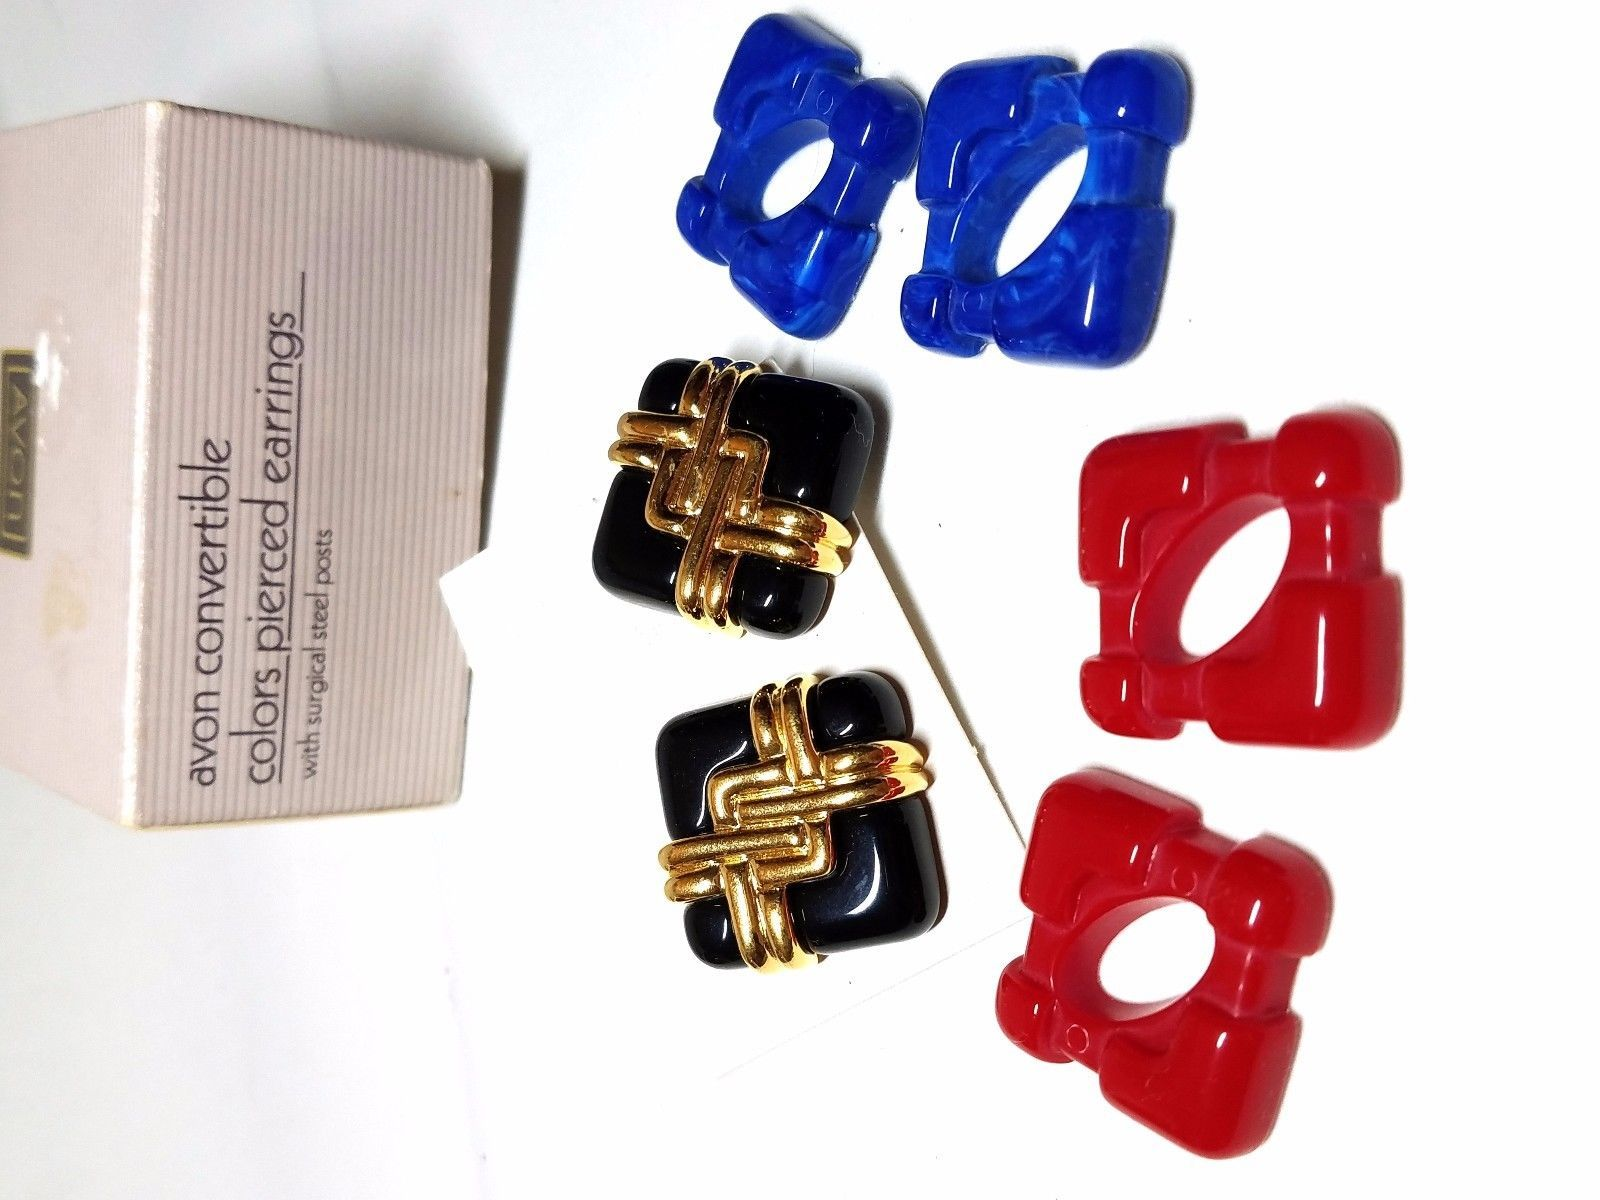 2a710ec4f Avon Convertible Colors Pierced Earrings Vintage Red Blue Black - $18.00